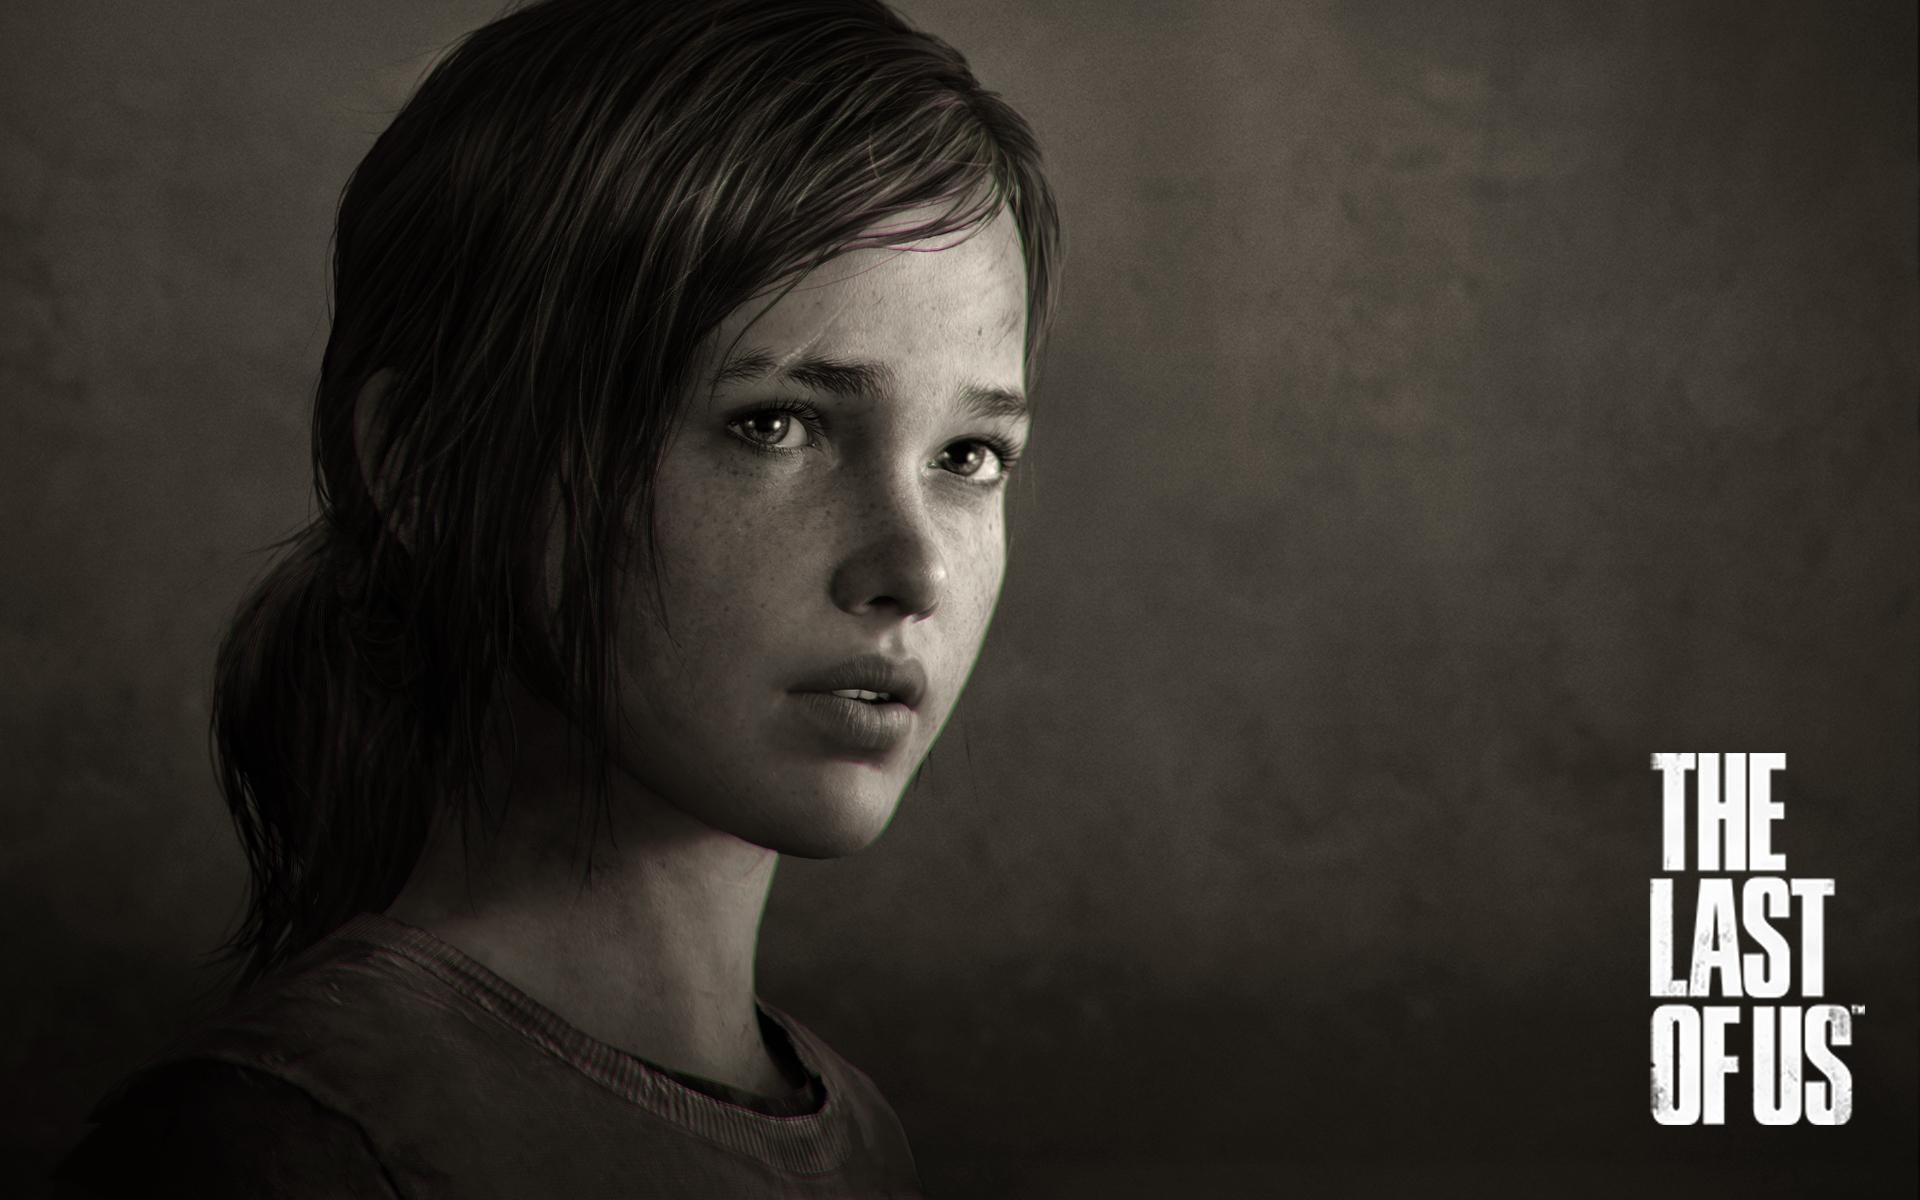 The Last of Us Ellie Wallpaper